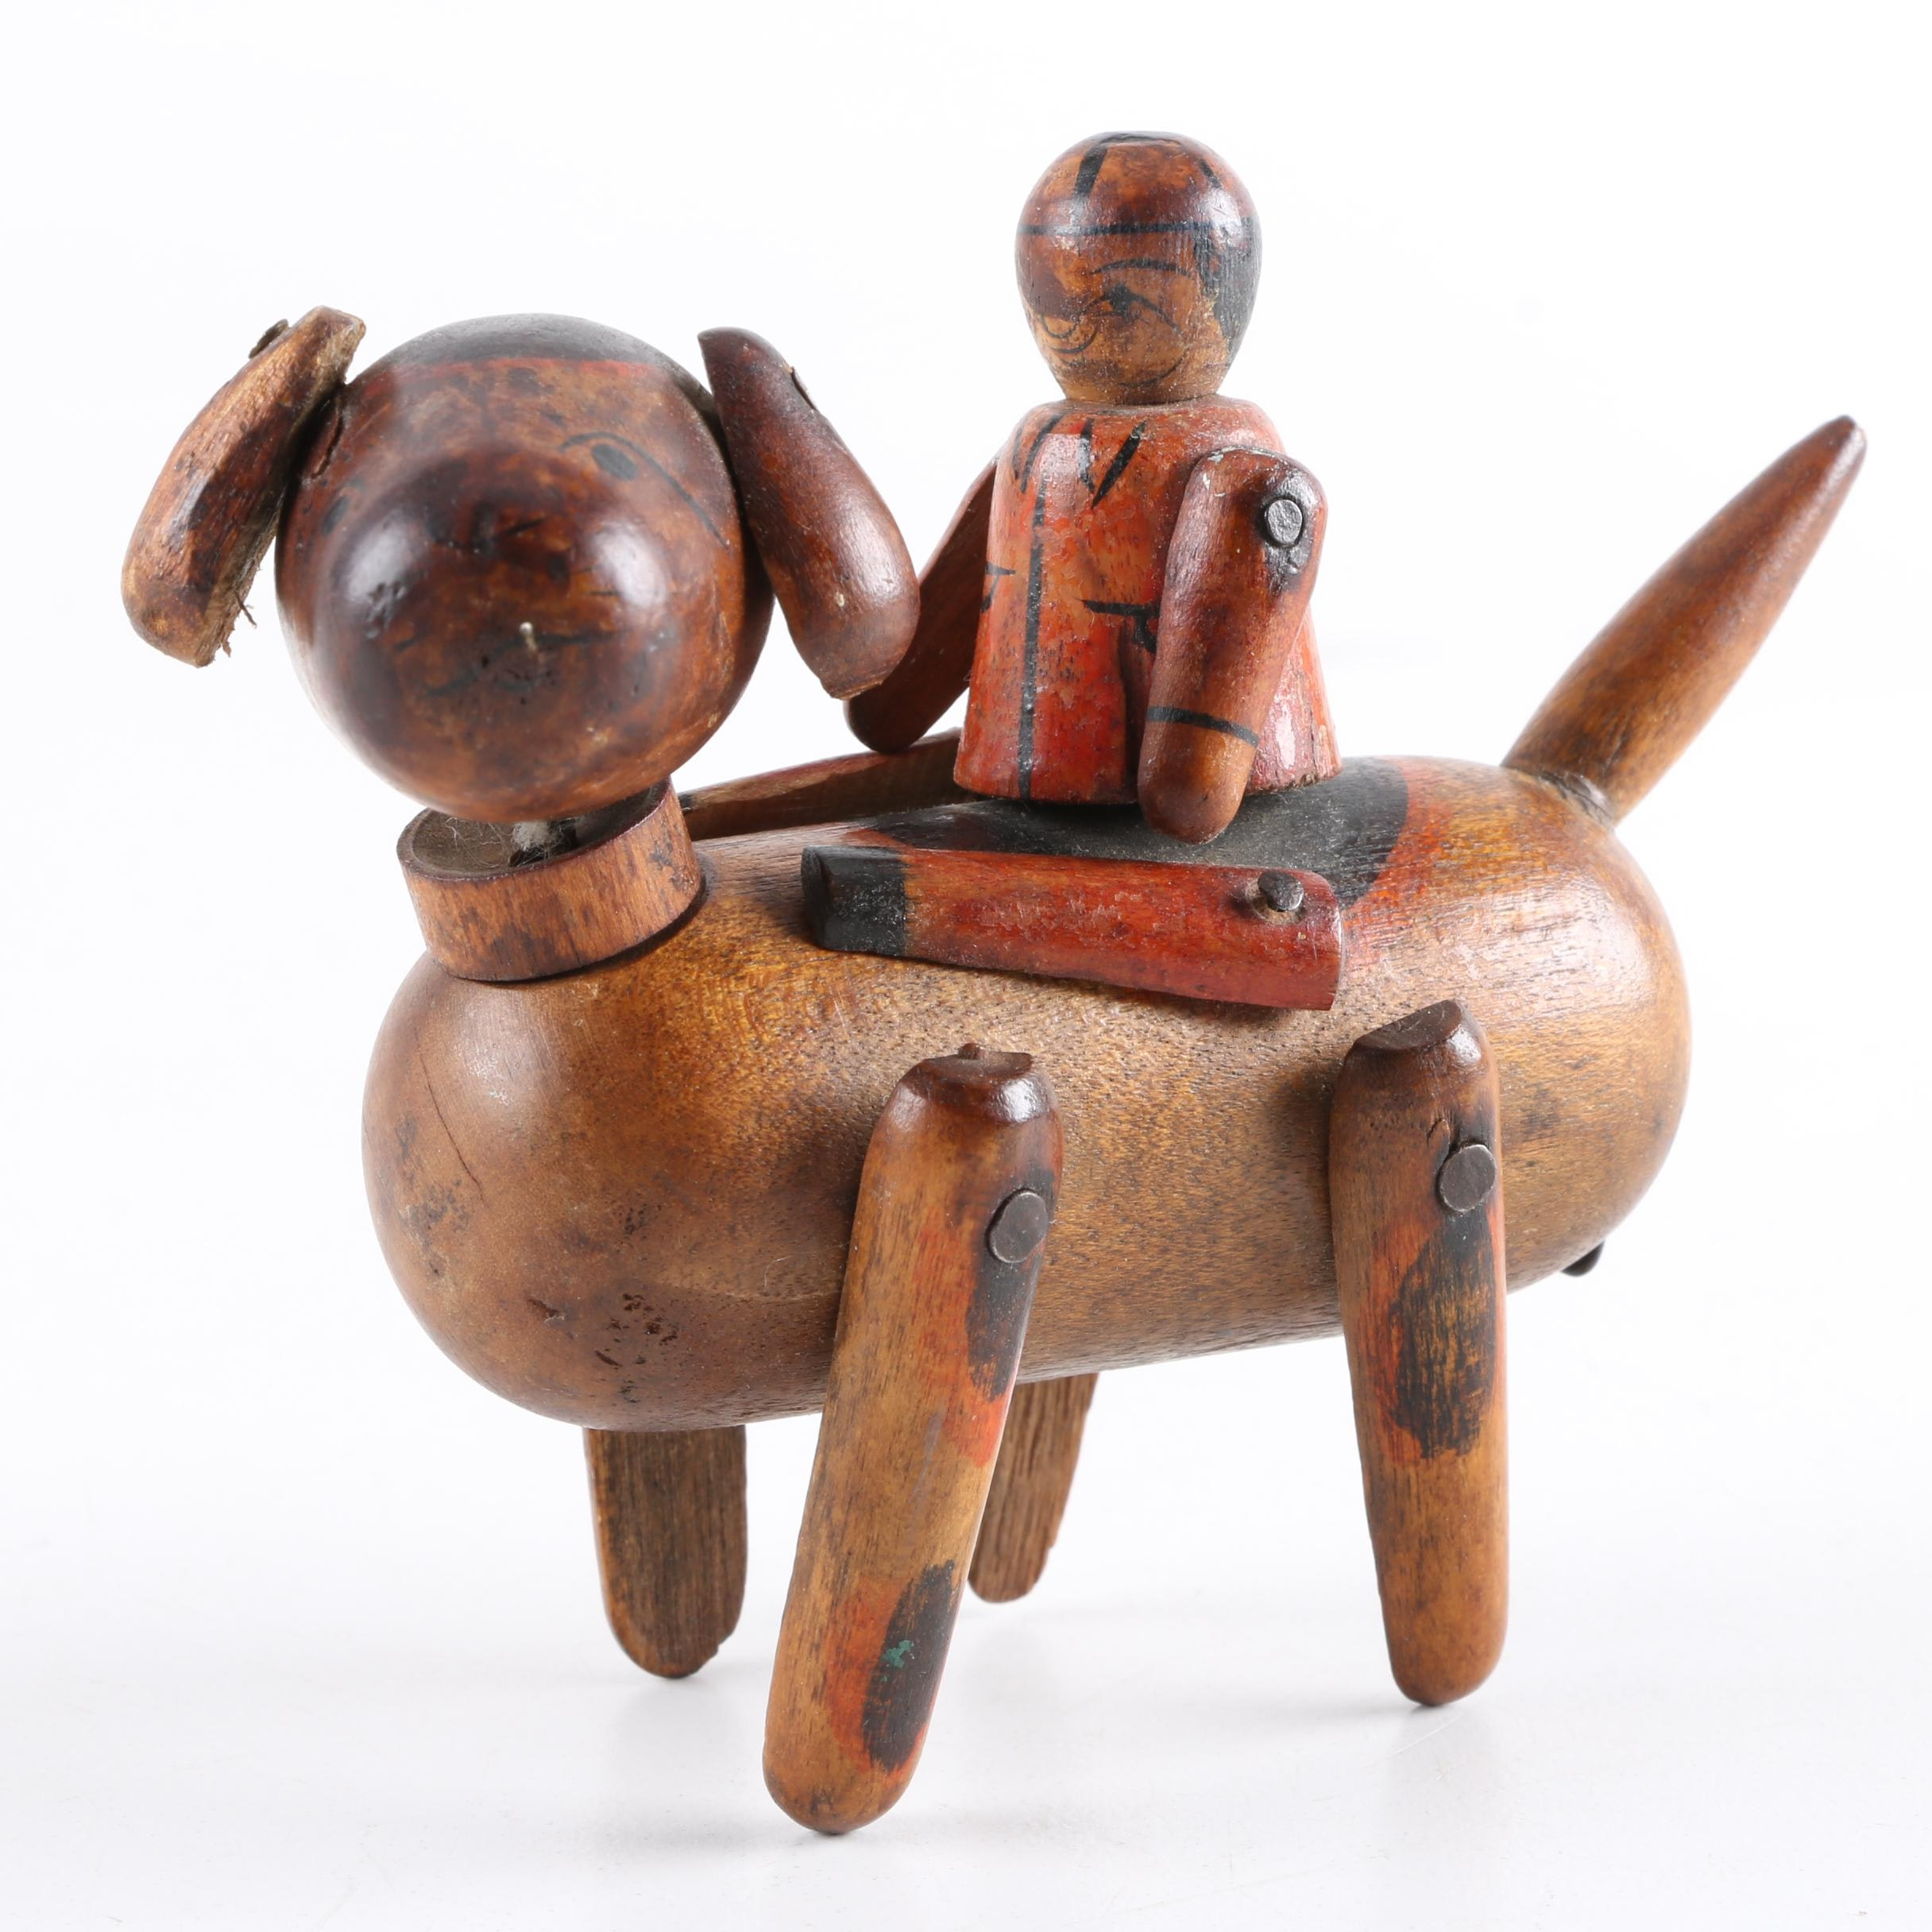 Vintage Wooden Boy and Dog Figure